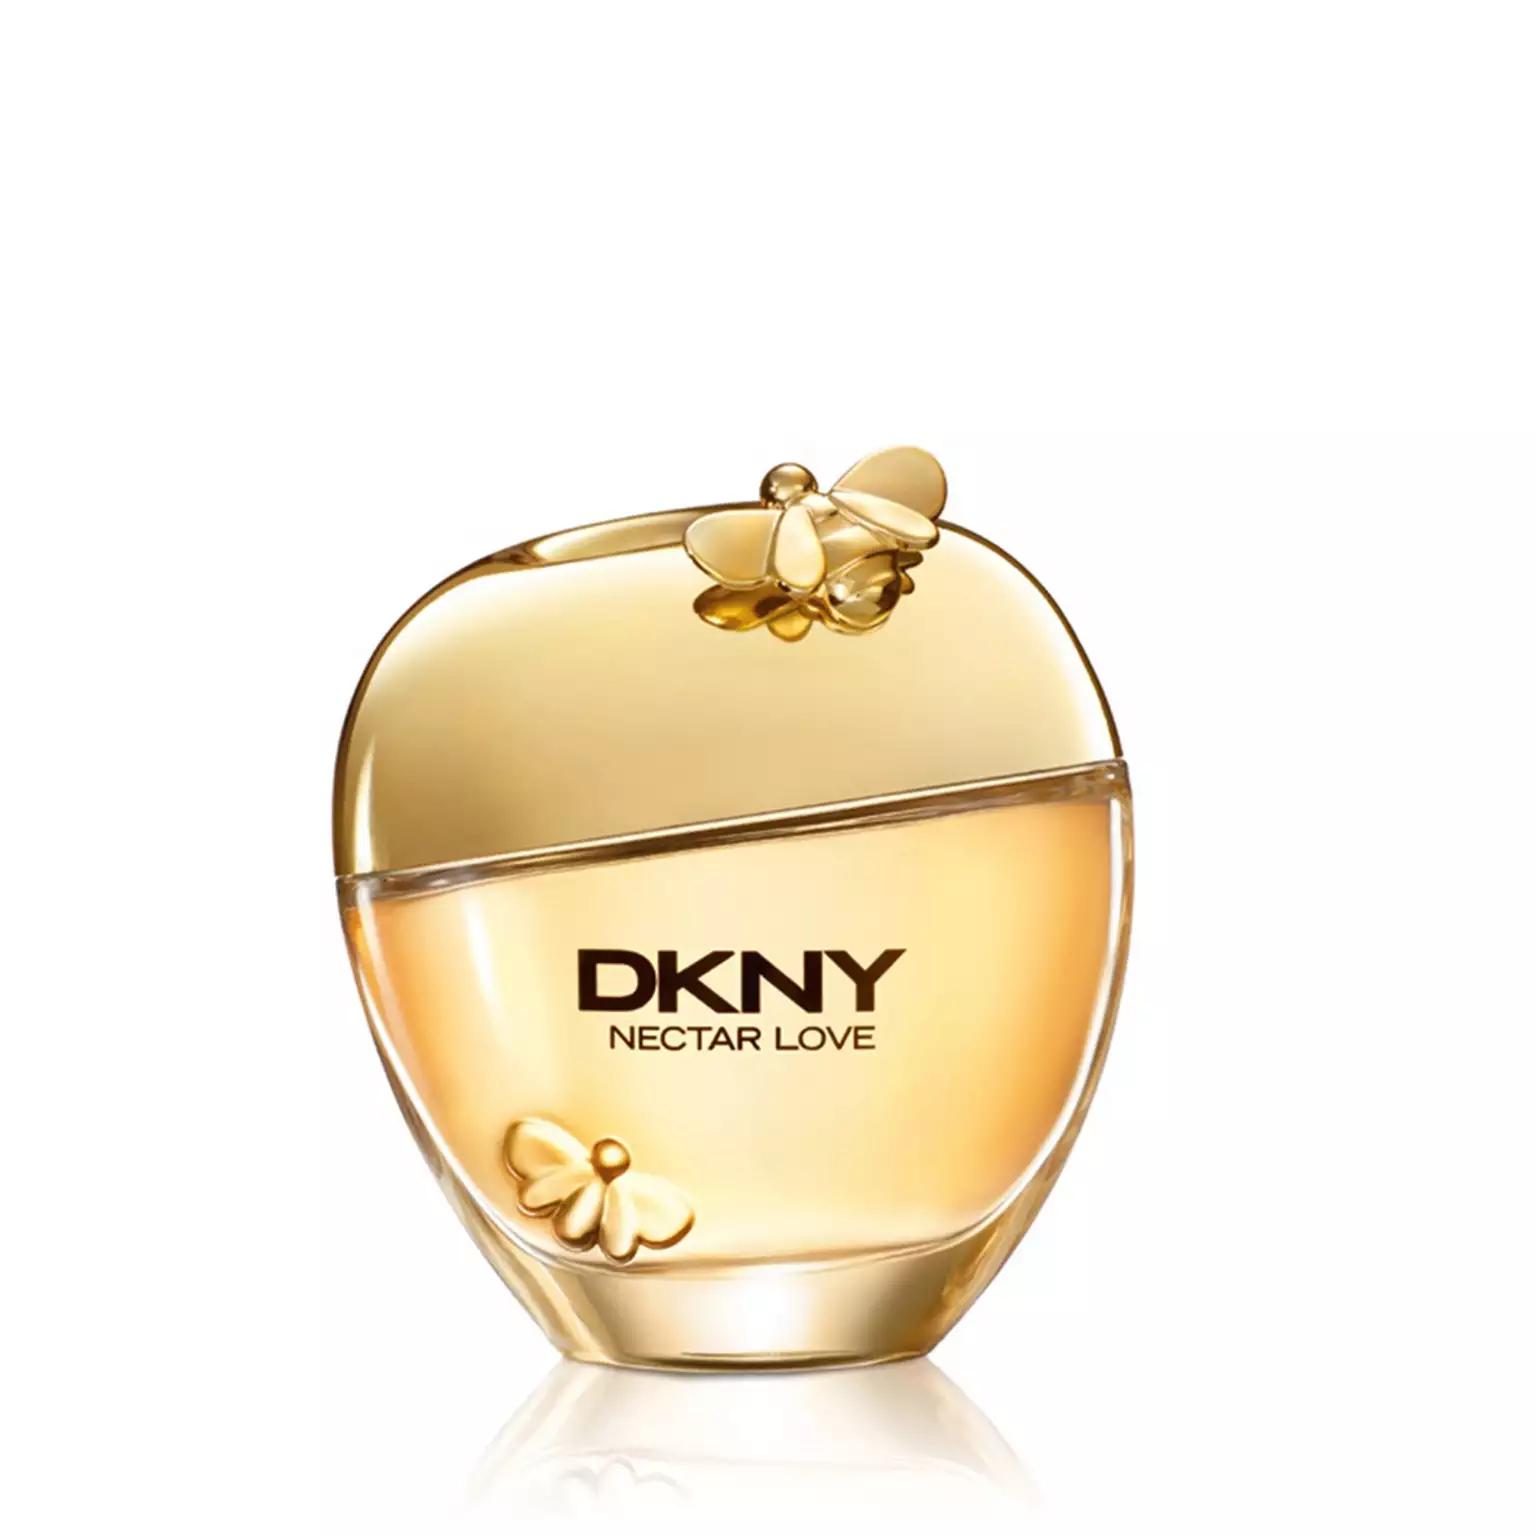 DKNY Nectar Love Eau de Parfum 50ml now £27.50 + Free Delivery @ Debenhams